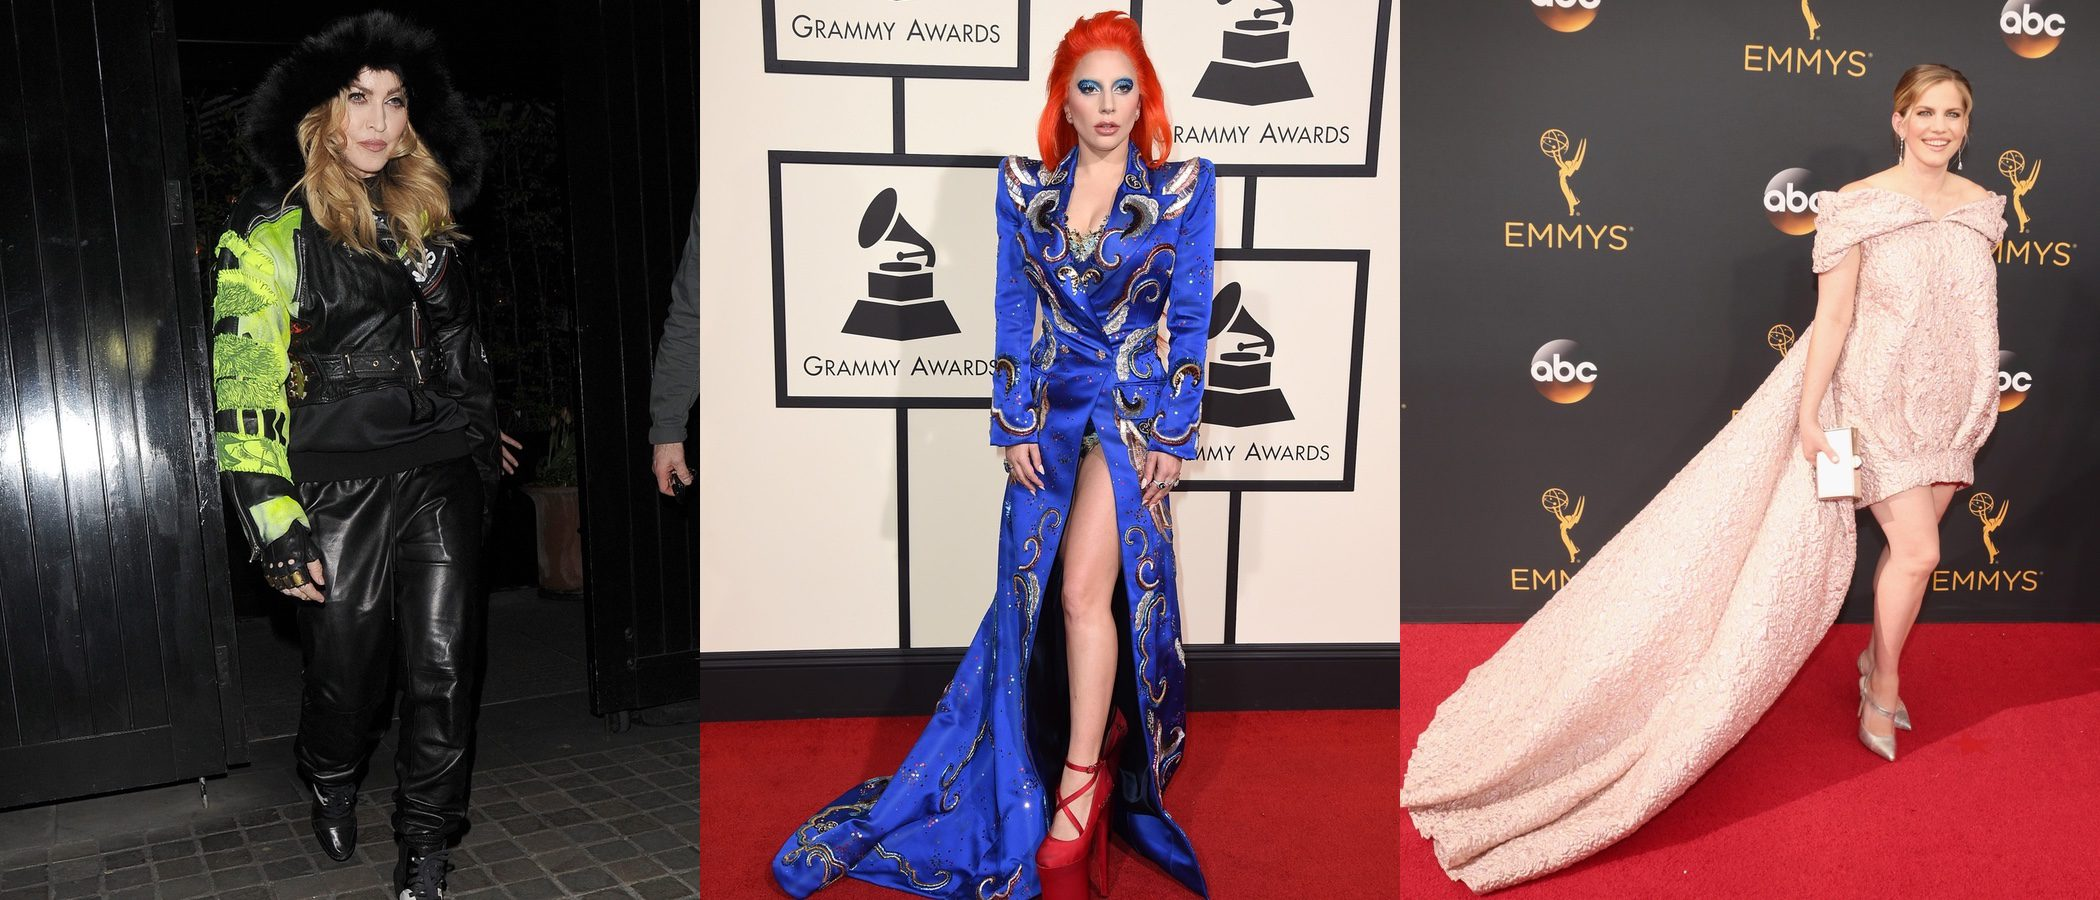 Las 12 peor vestidas de 2016: De Kim Kardashian a Ariel Winter pasando por Rihanna